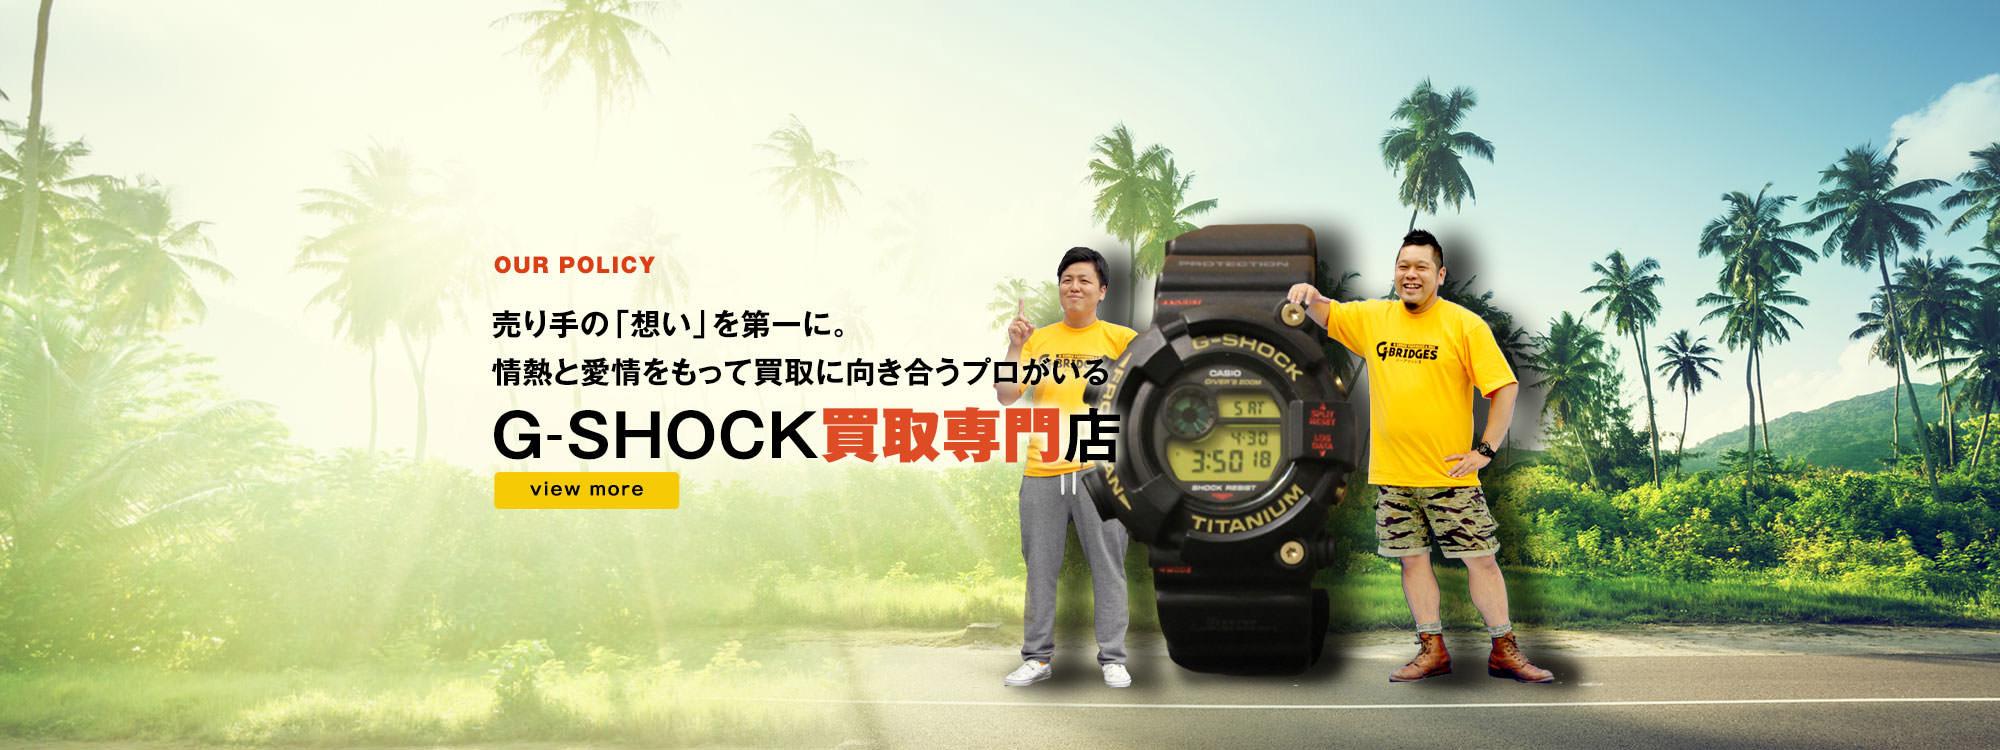 G-SHOCK買い取り専門店